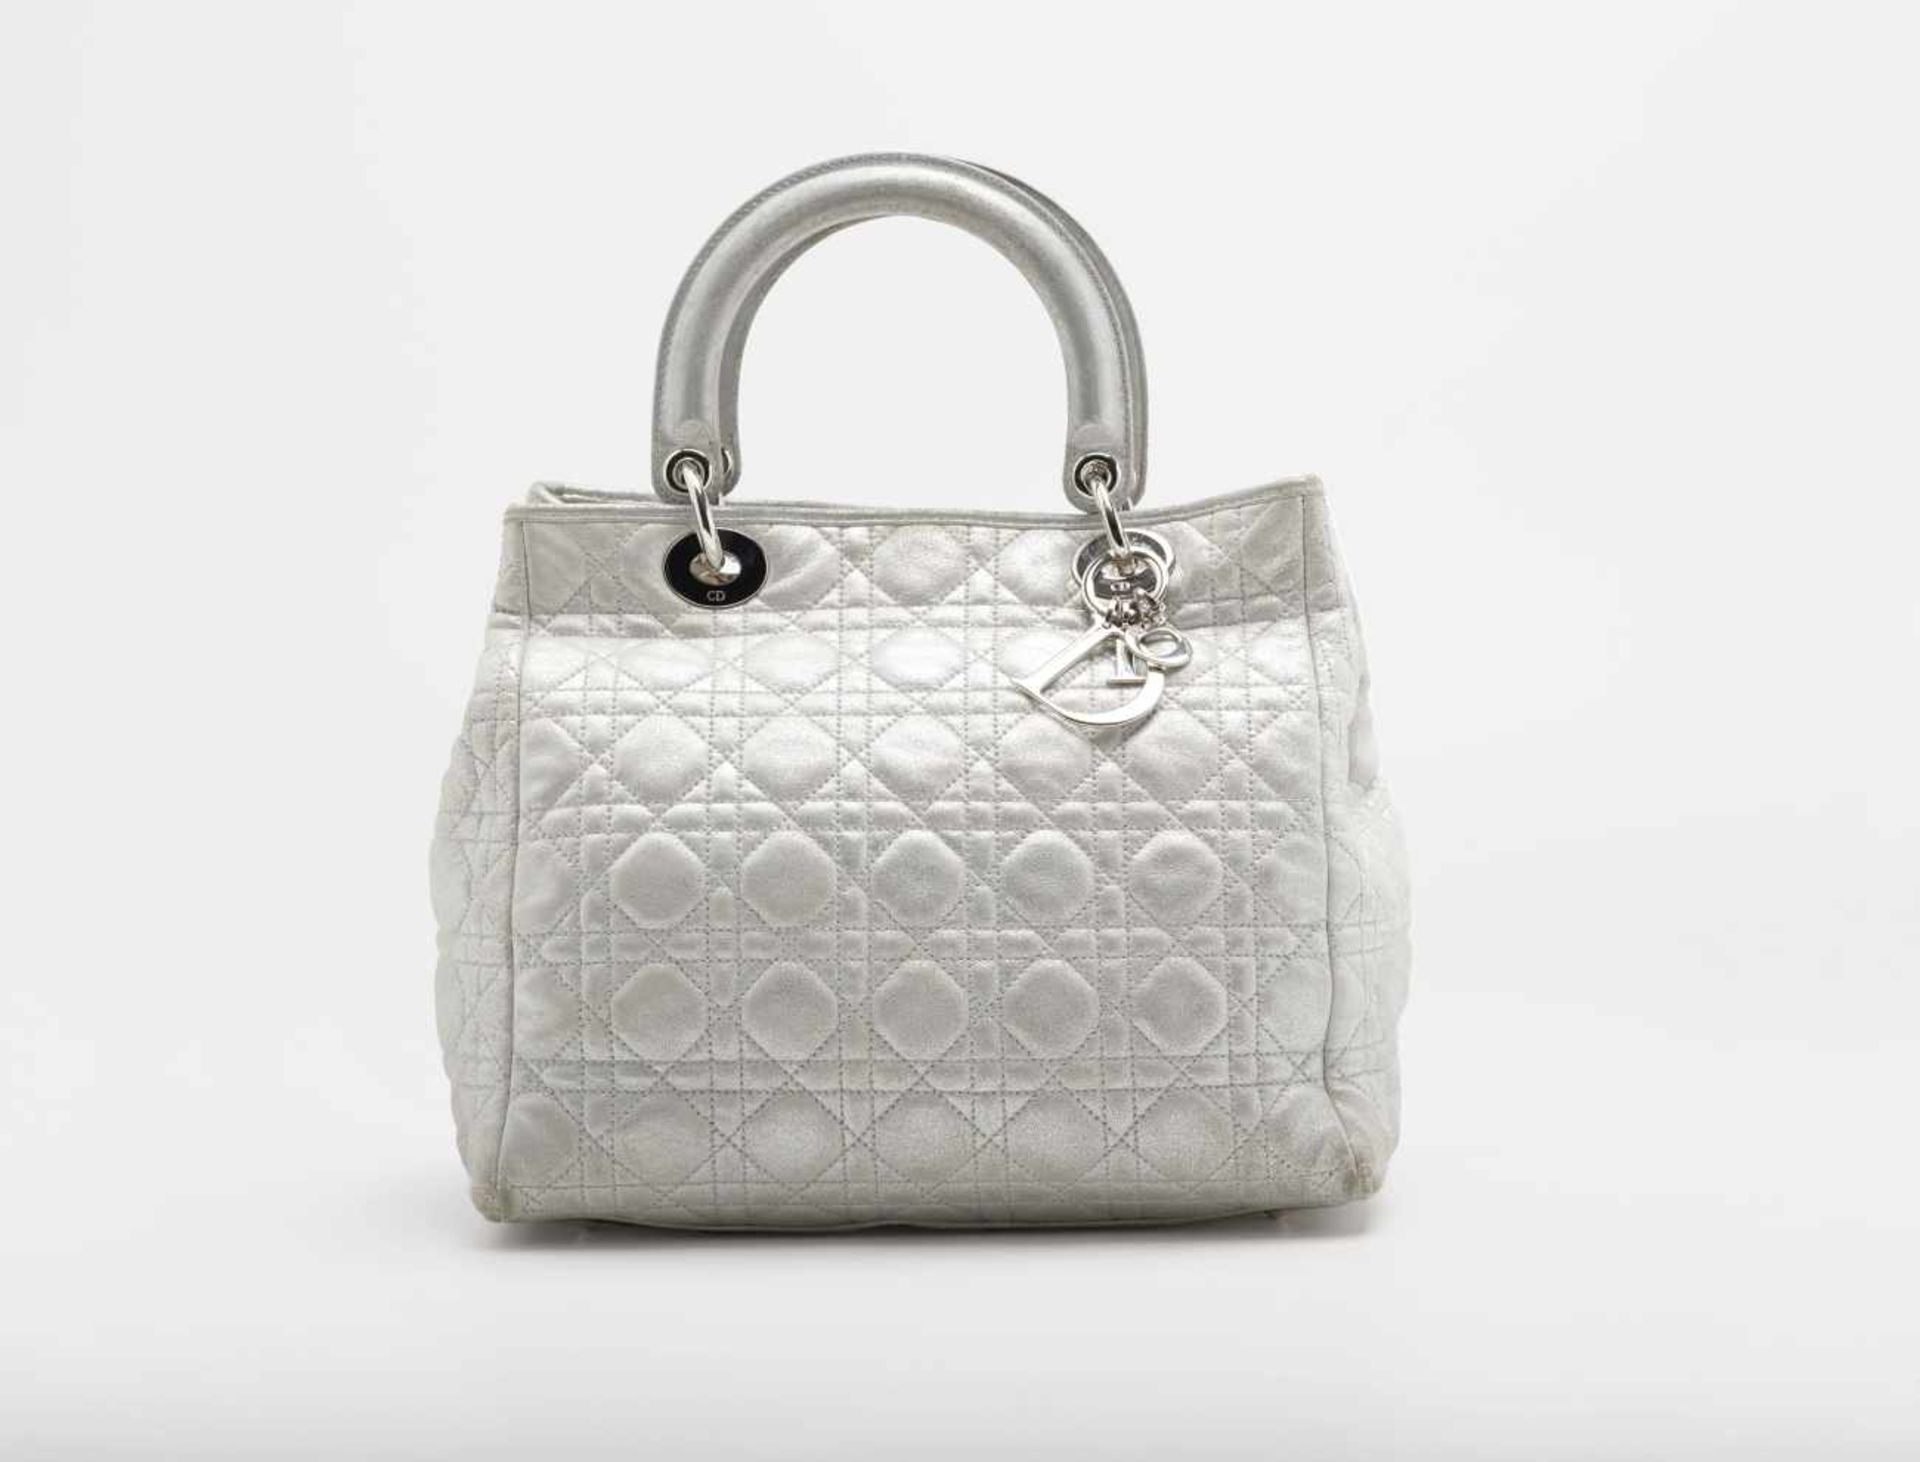 HandbagGianfranco Ferré for Christian Dior Boutique, Paris Quilted lamb leather, metallic silver.